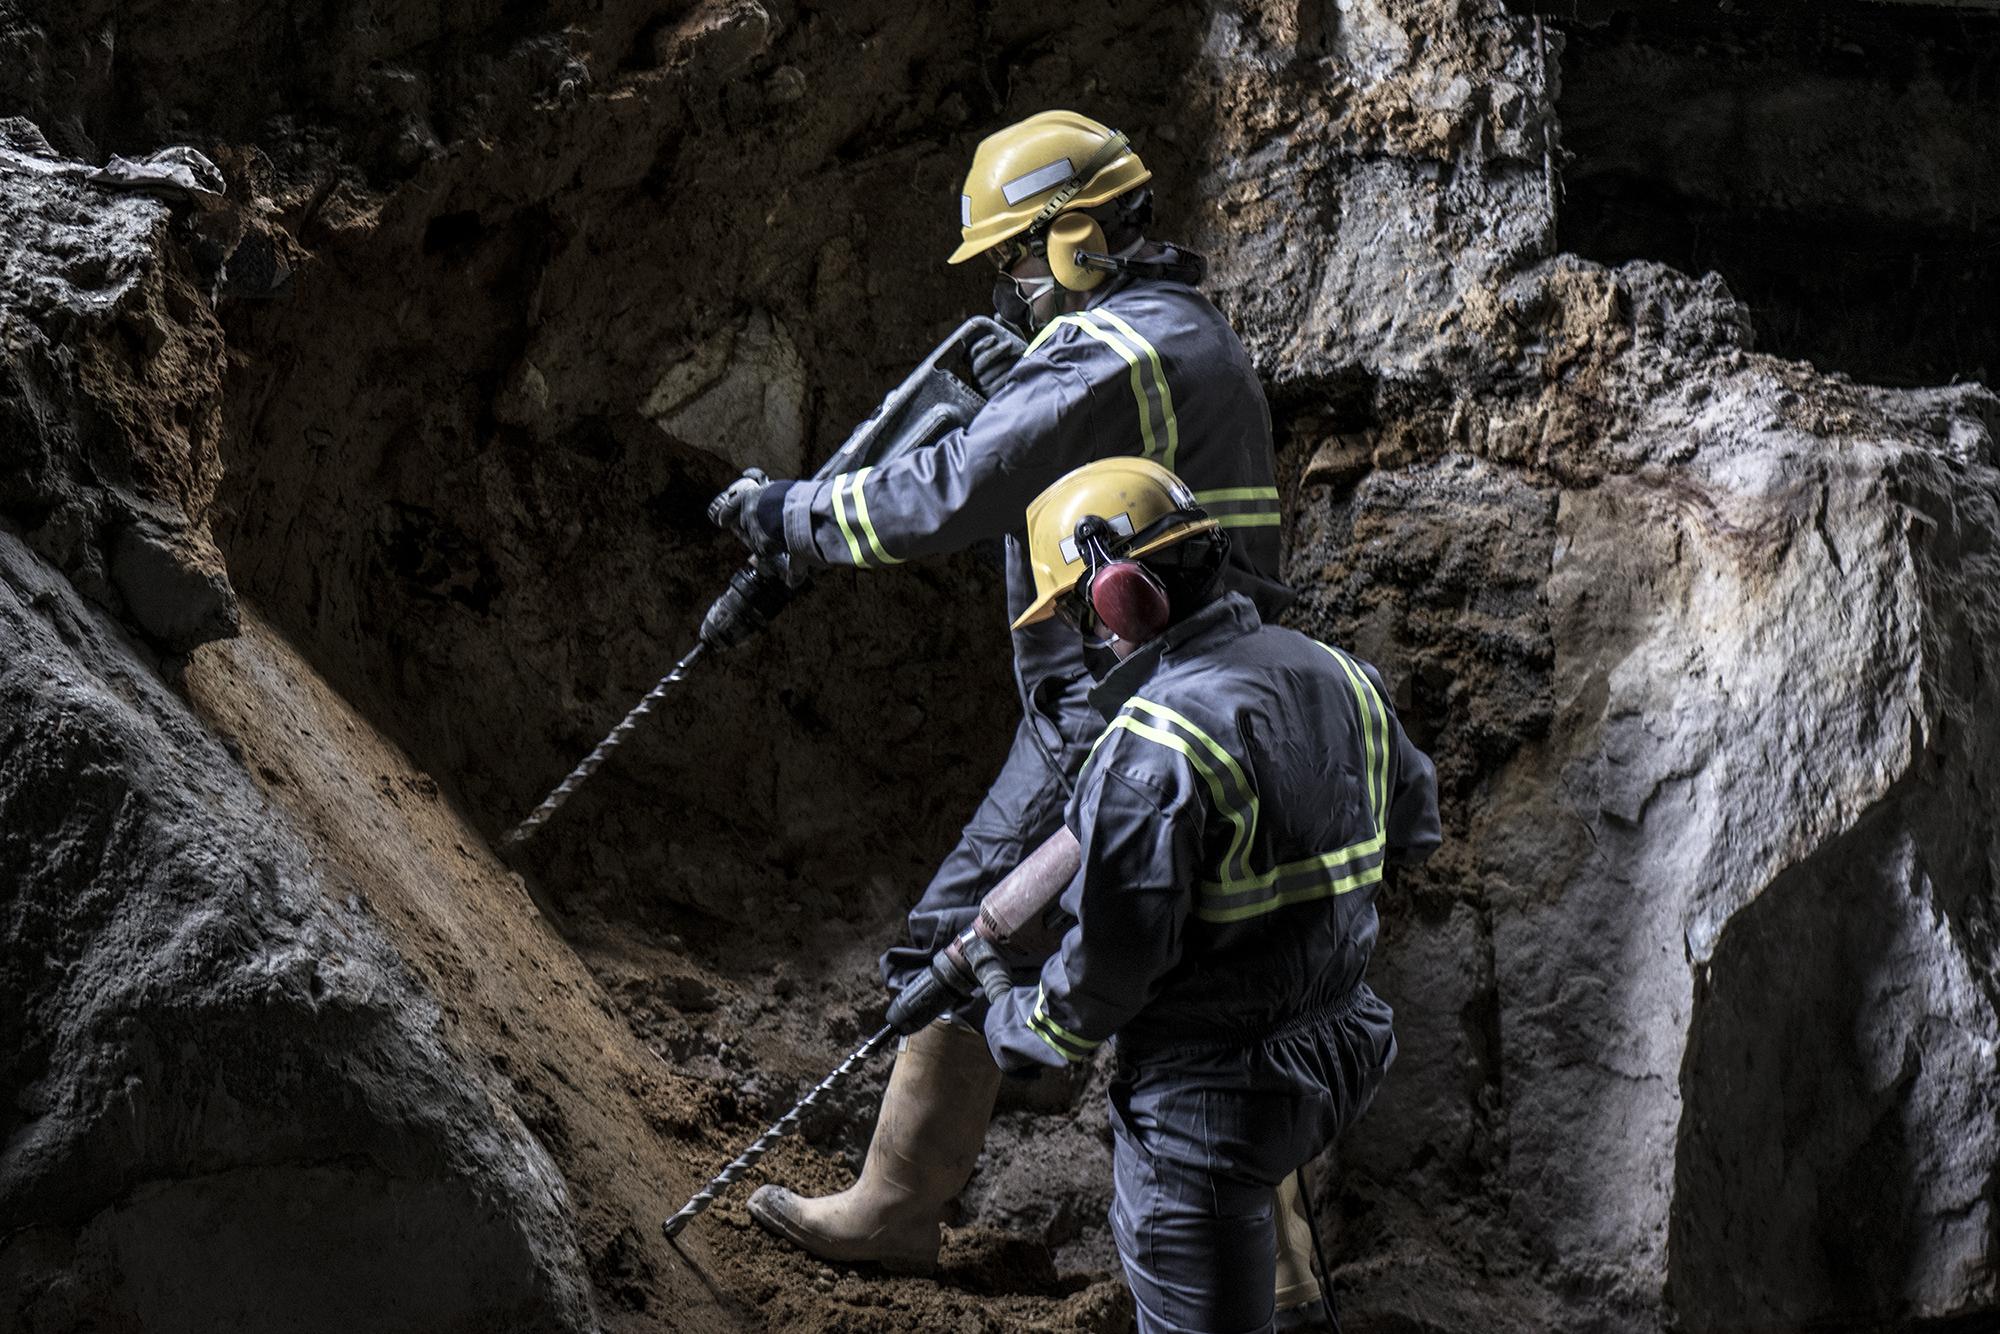 Vibration hazards in mining